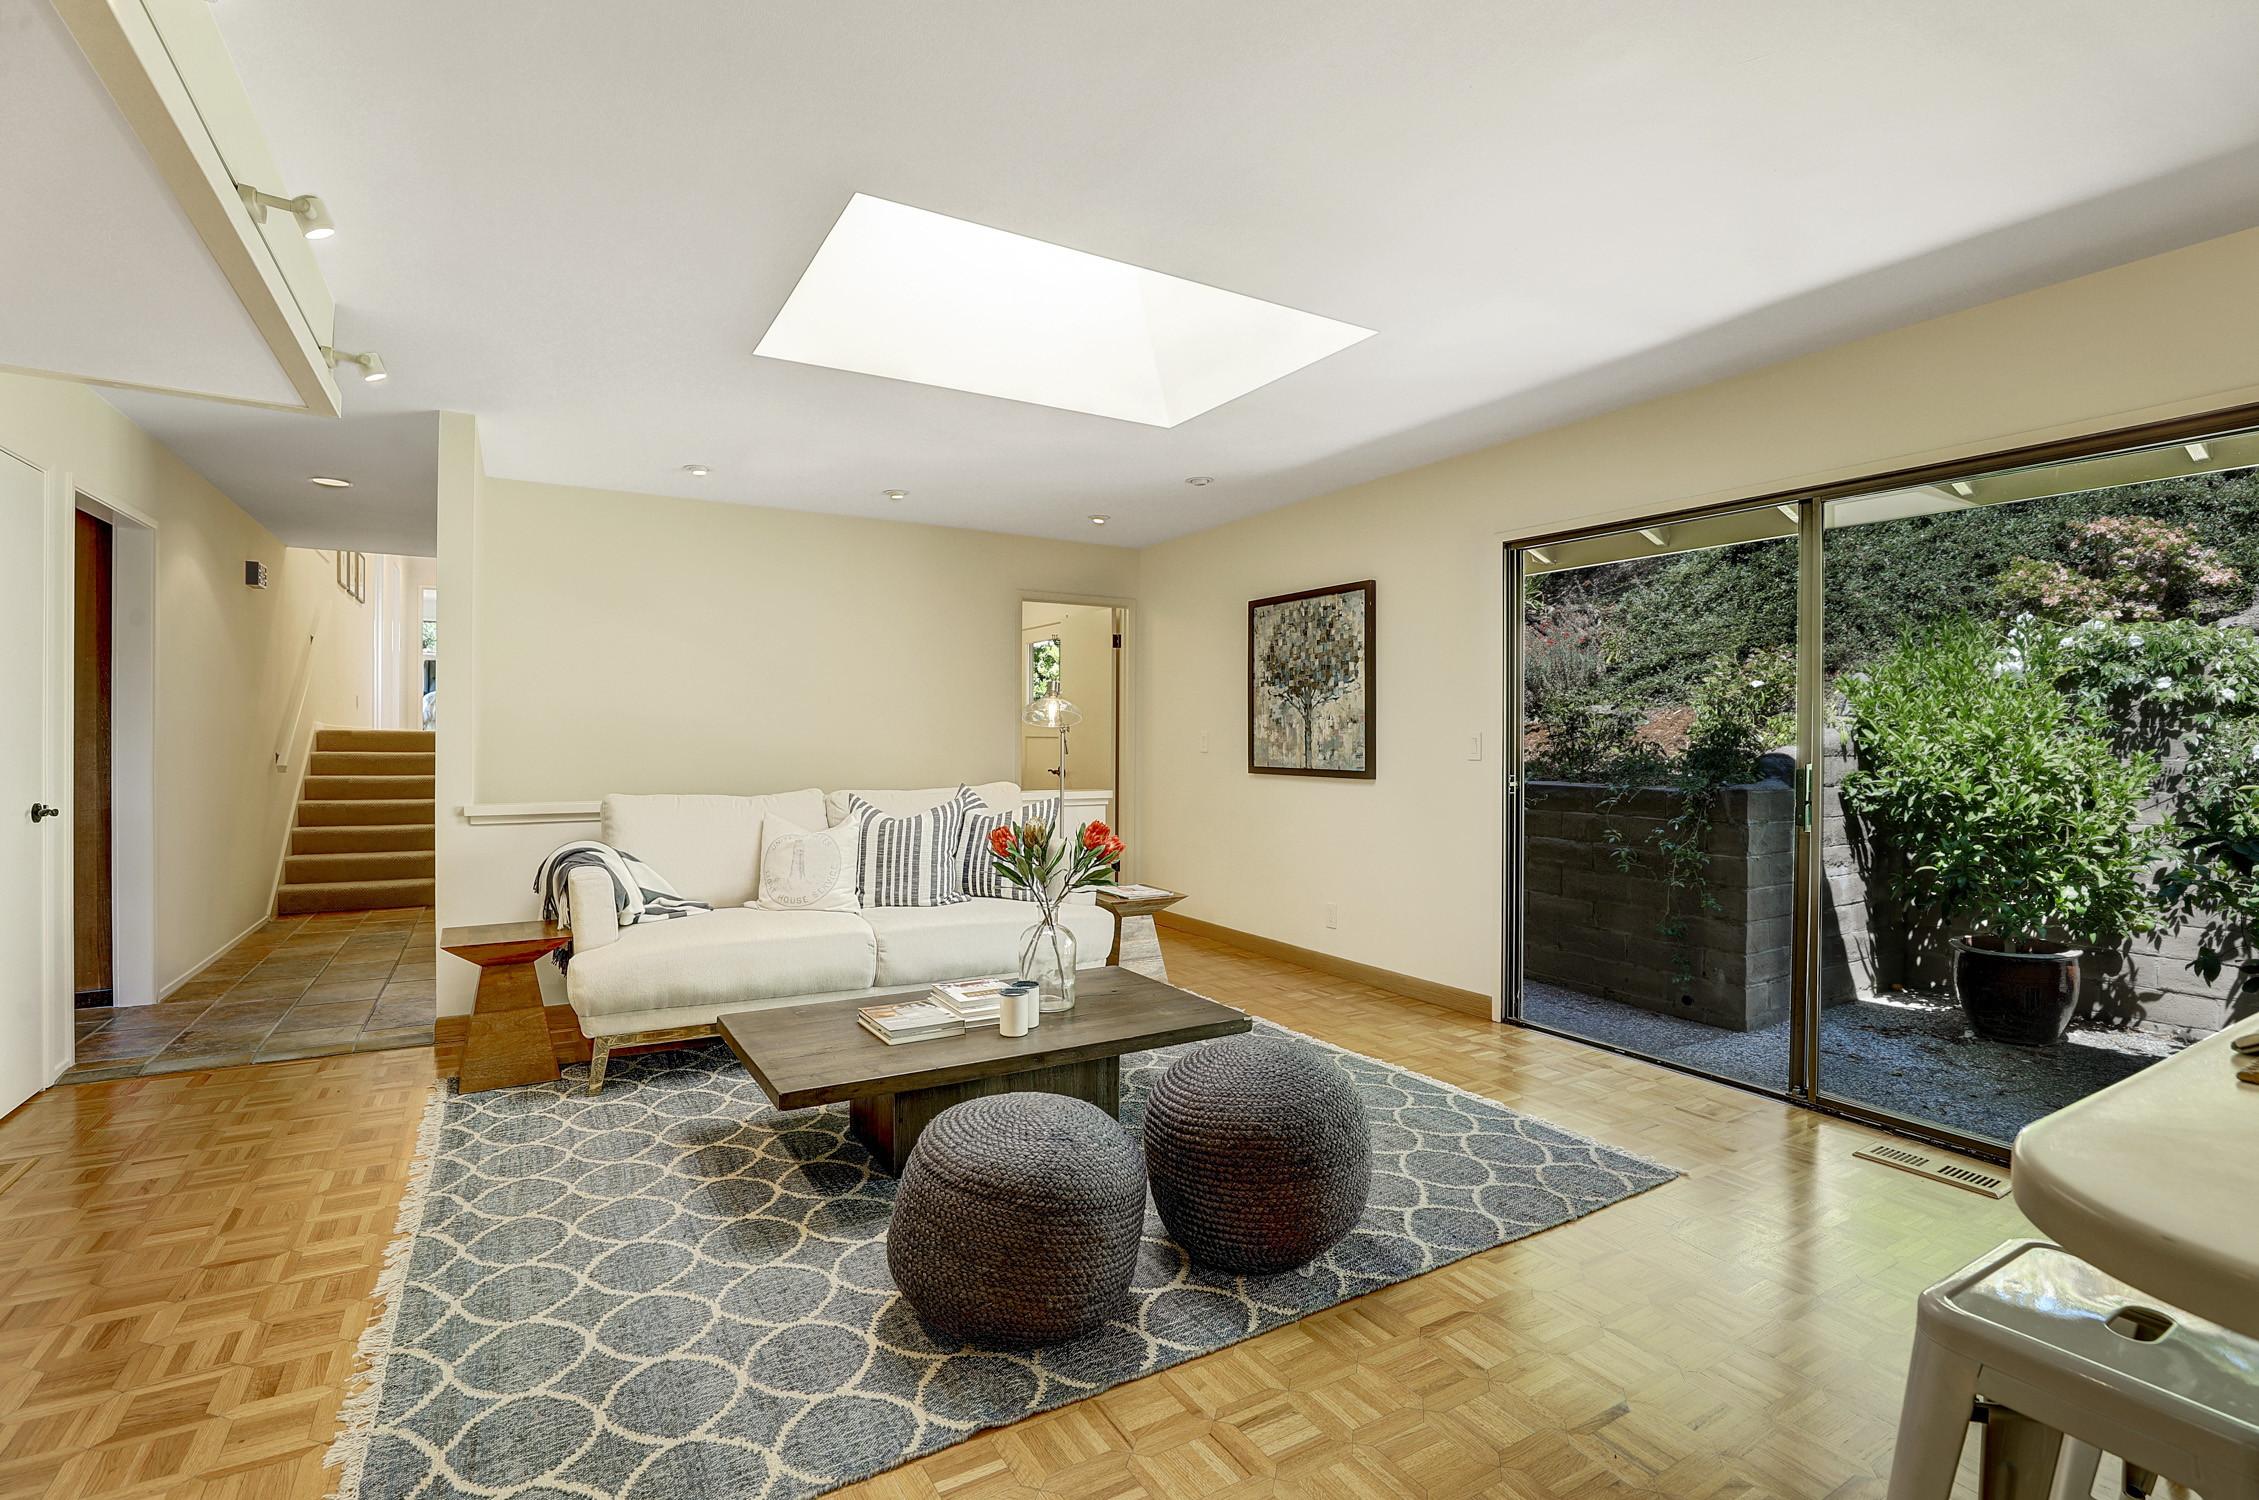 16Dorian 18 MLSSan Rafael Real Estate - Listed by Julia Fitzpatrick + Allie Fornesi Team Own Marin County .jpg